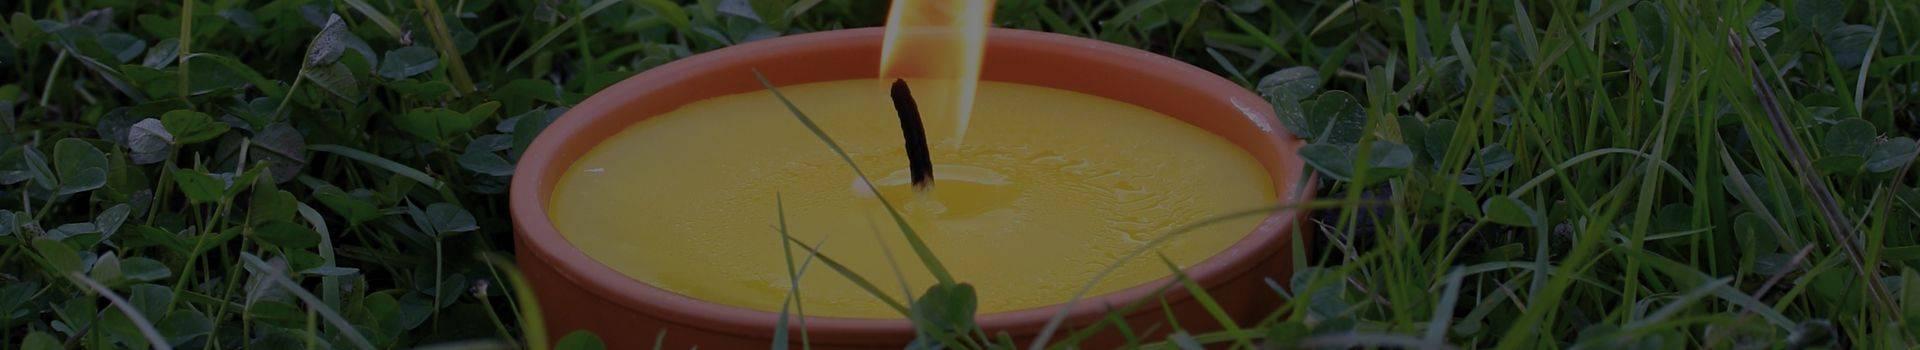 Velas de citronella. Velas animosquitos - Cereria Pinsart